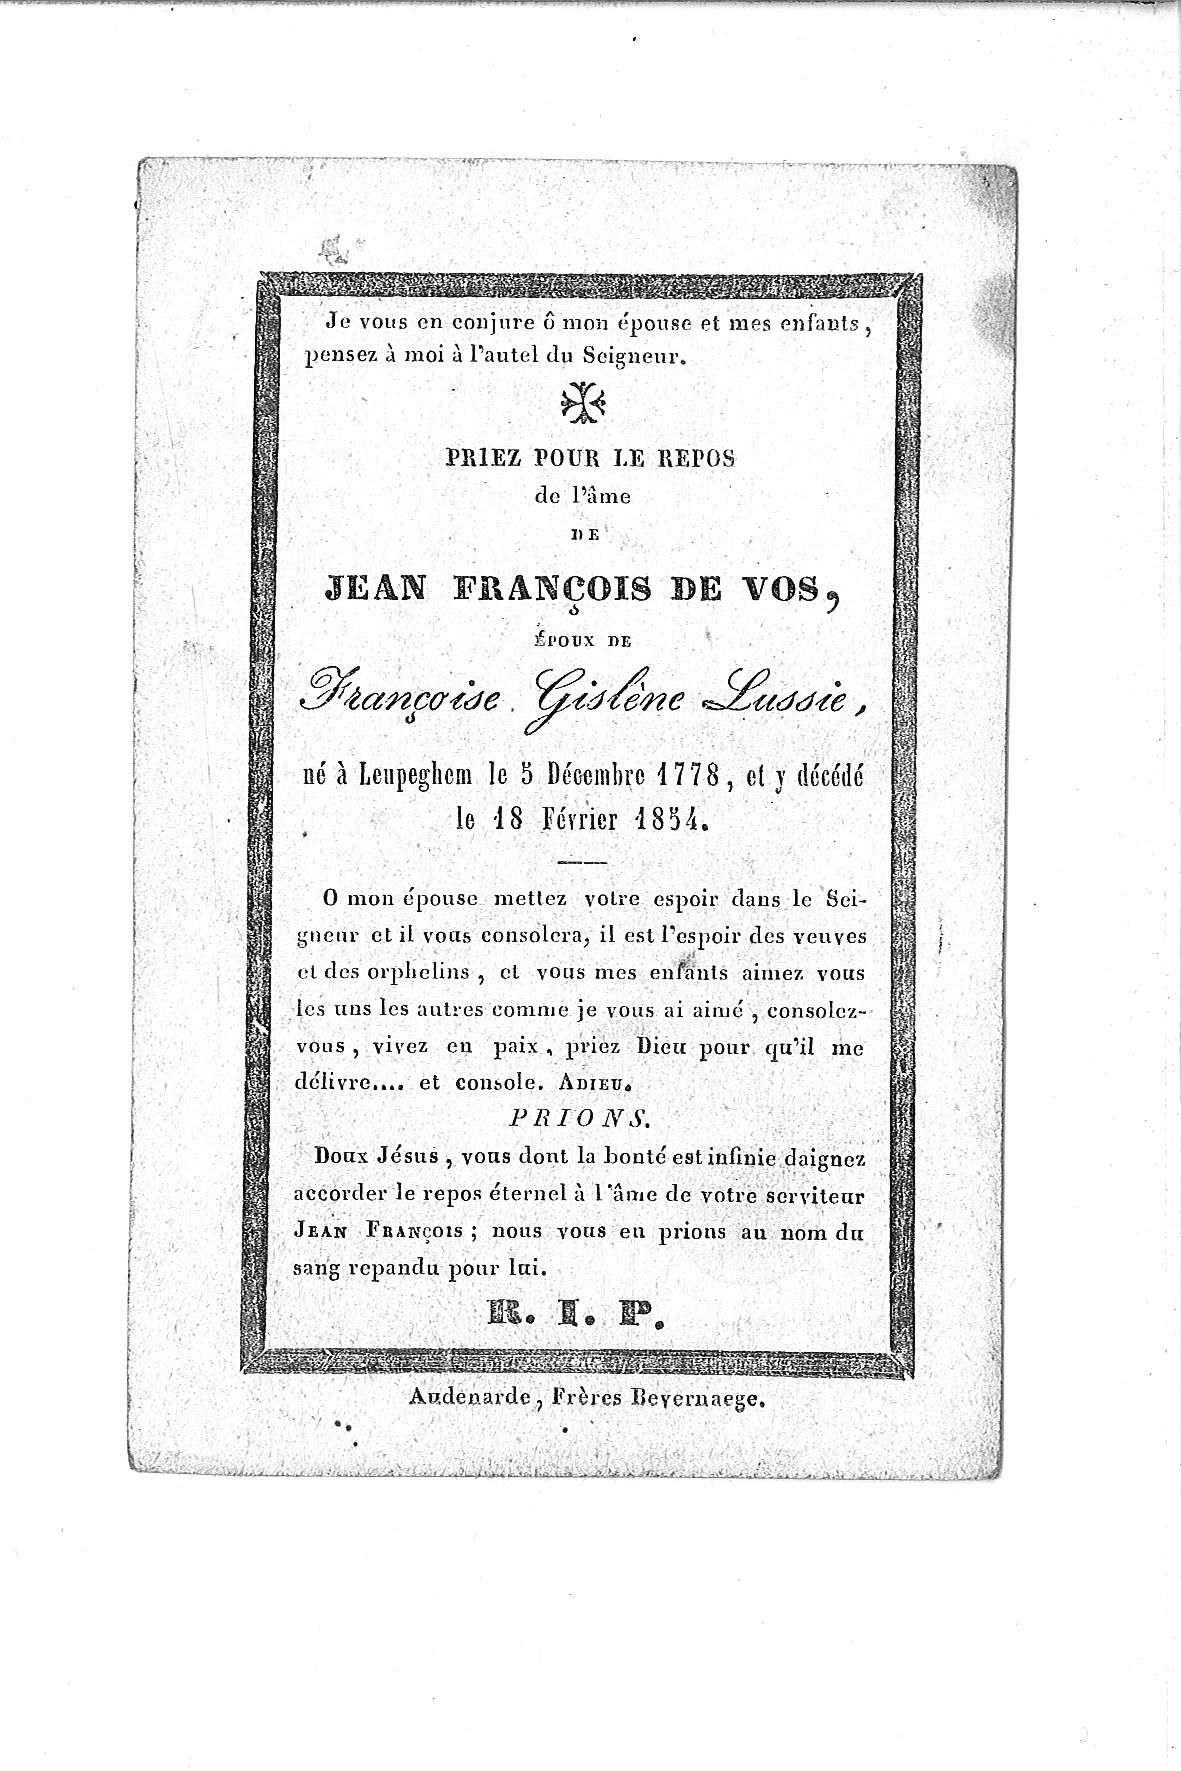 Jean François (1854) 20120309155314_00031.jpg